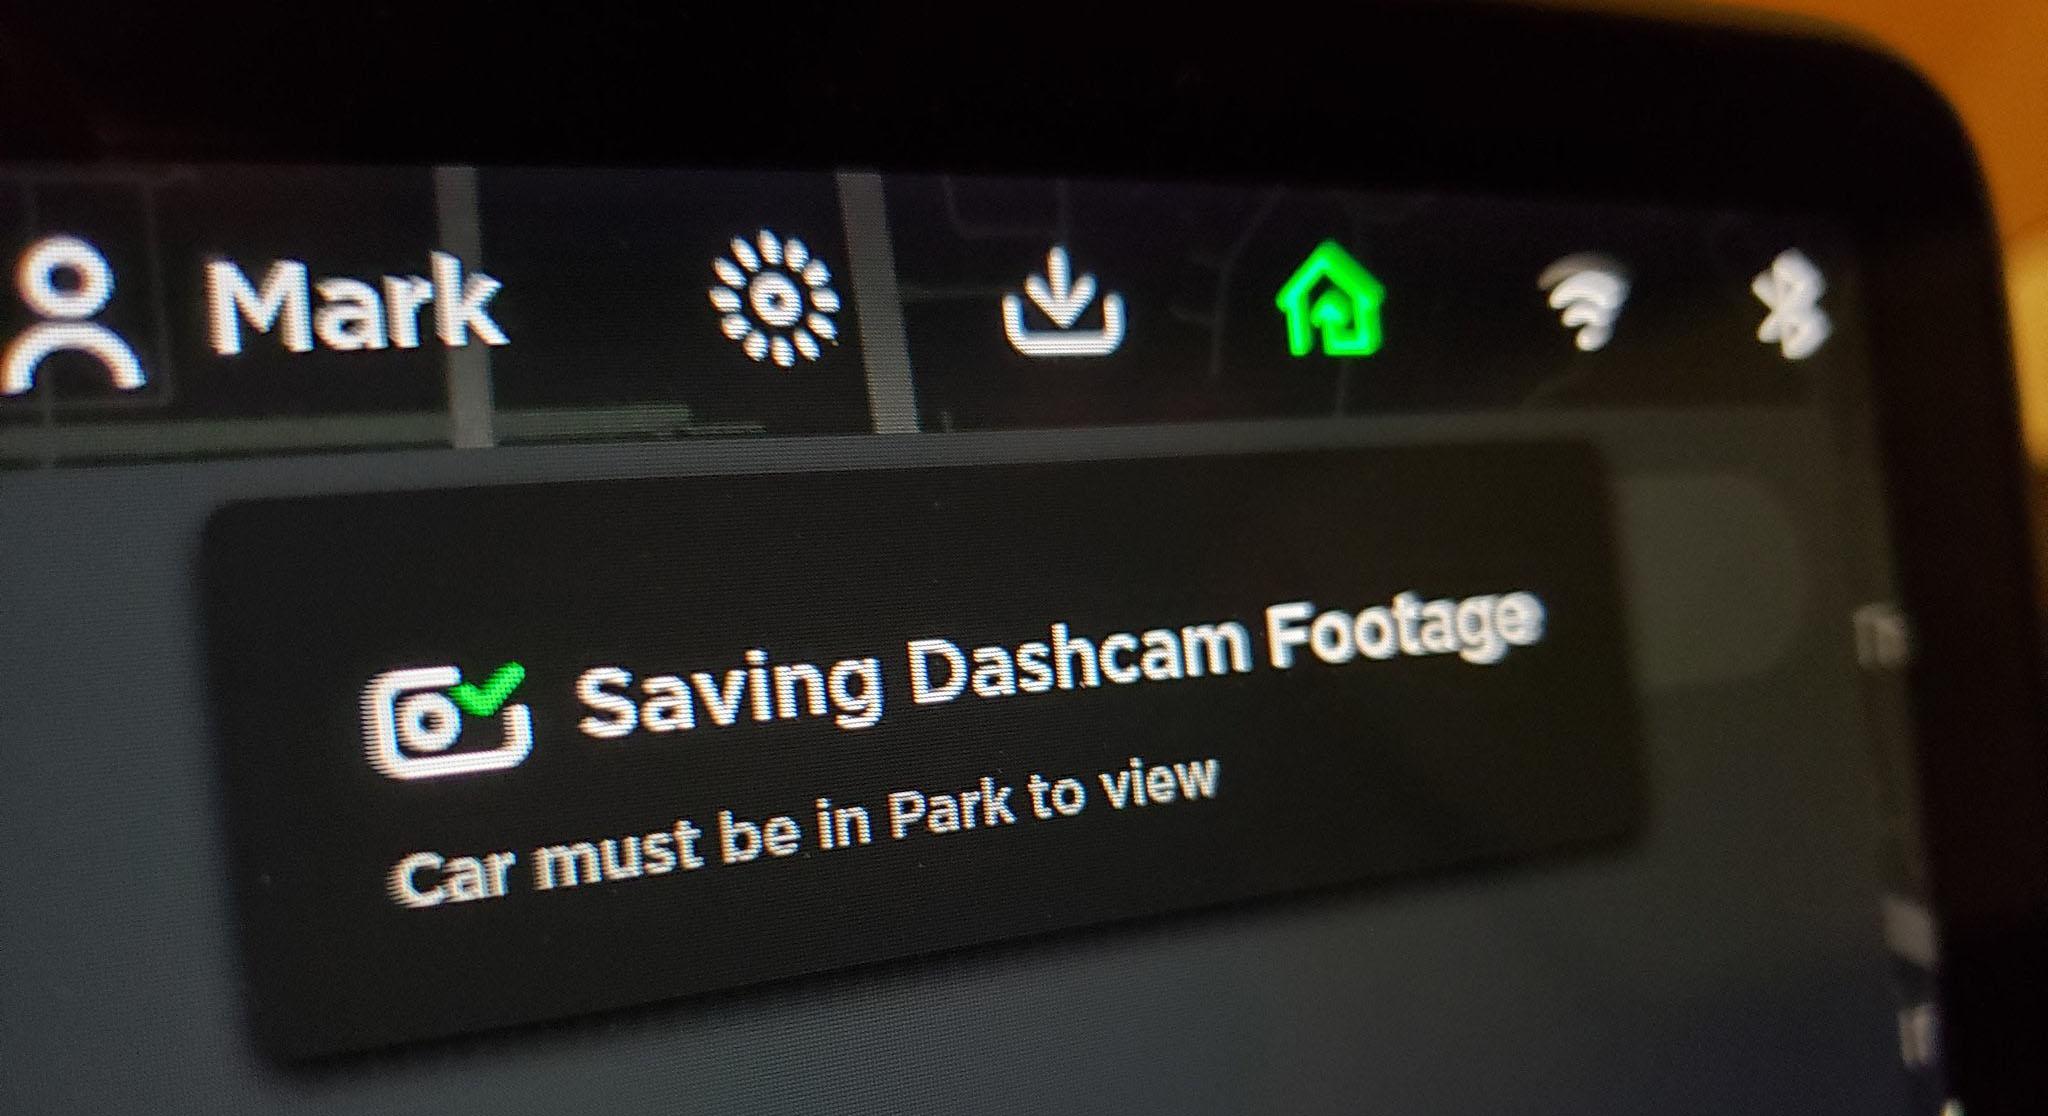 TeslaCam and Dashcam. Picture by @CodingMark